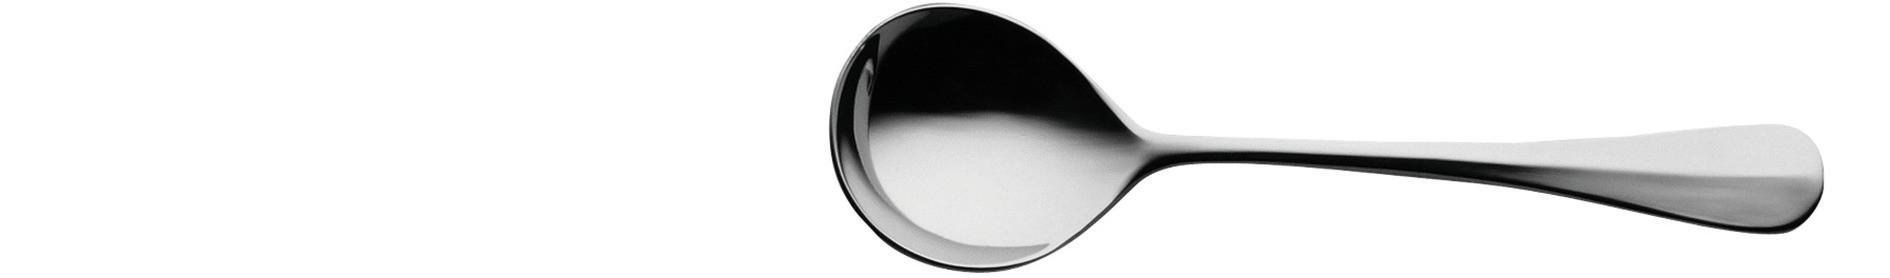 Baguette, Suppenlöffel 175 mm